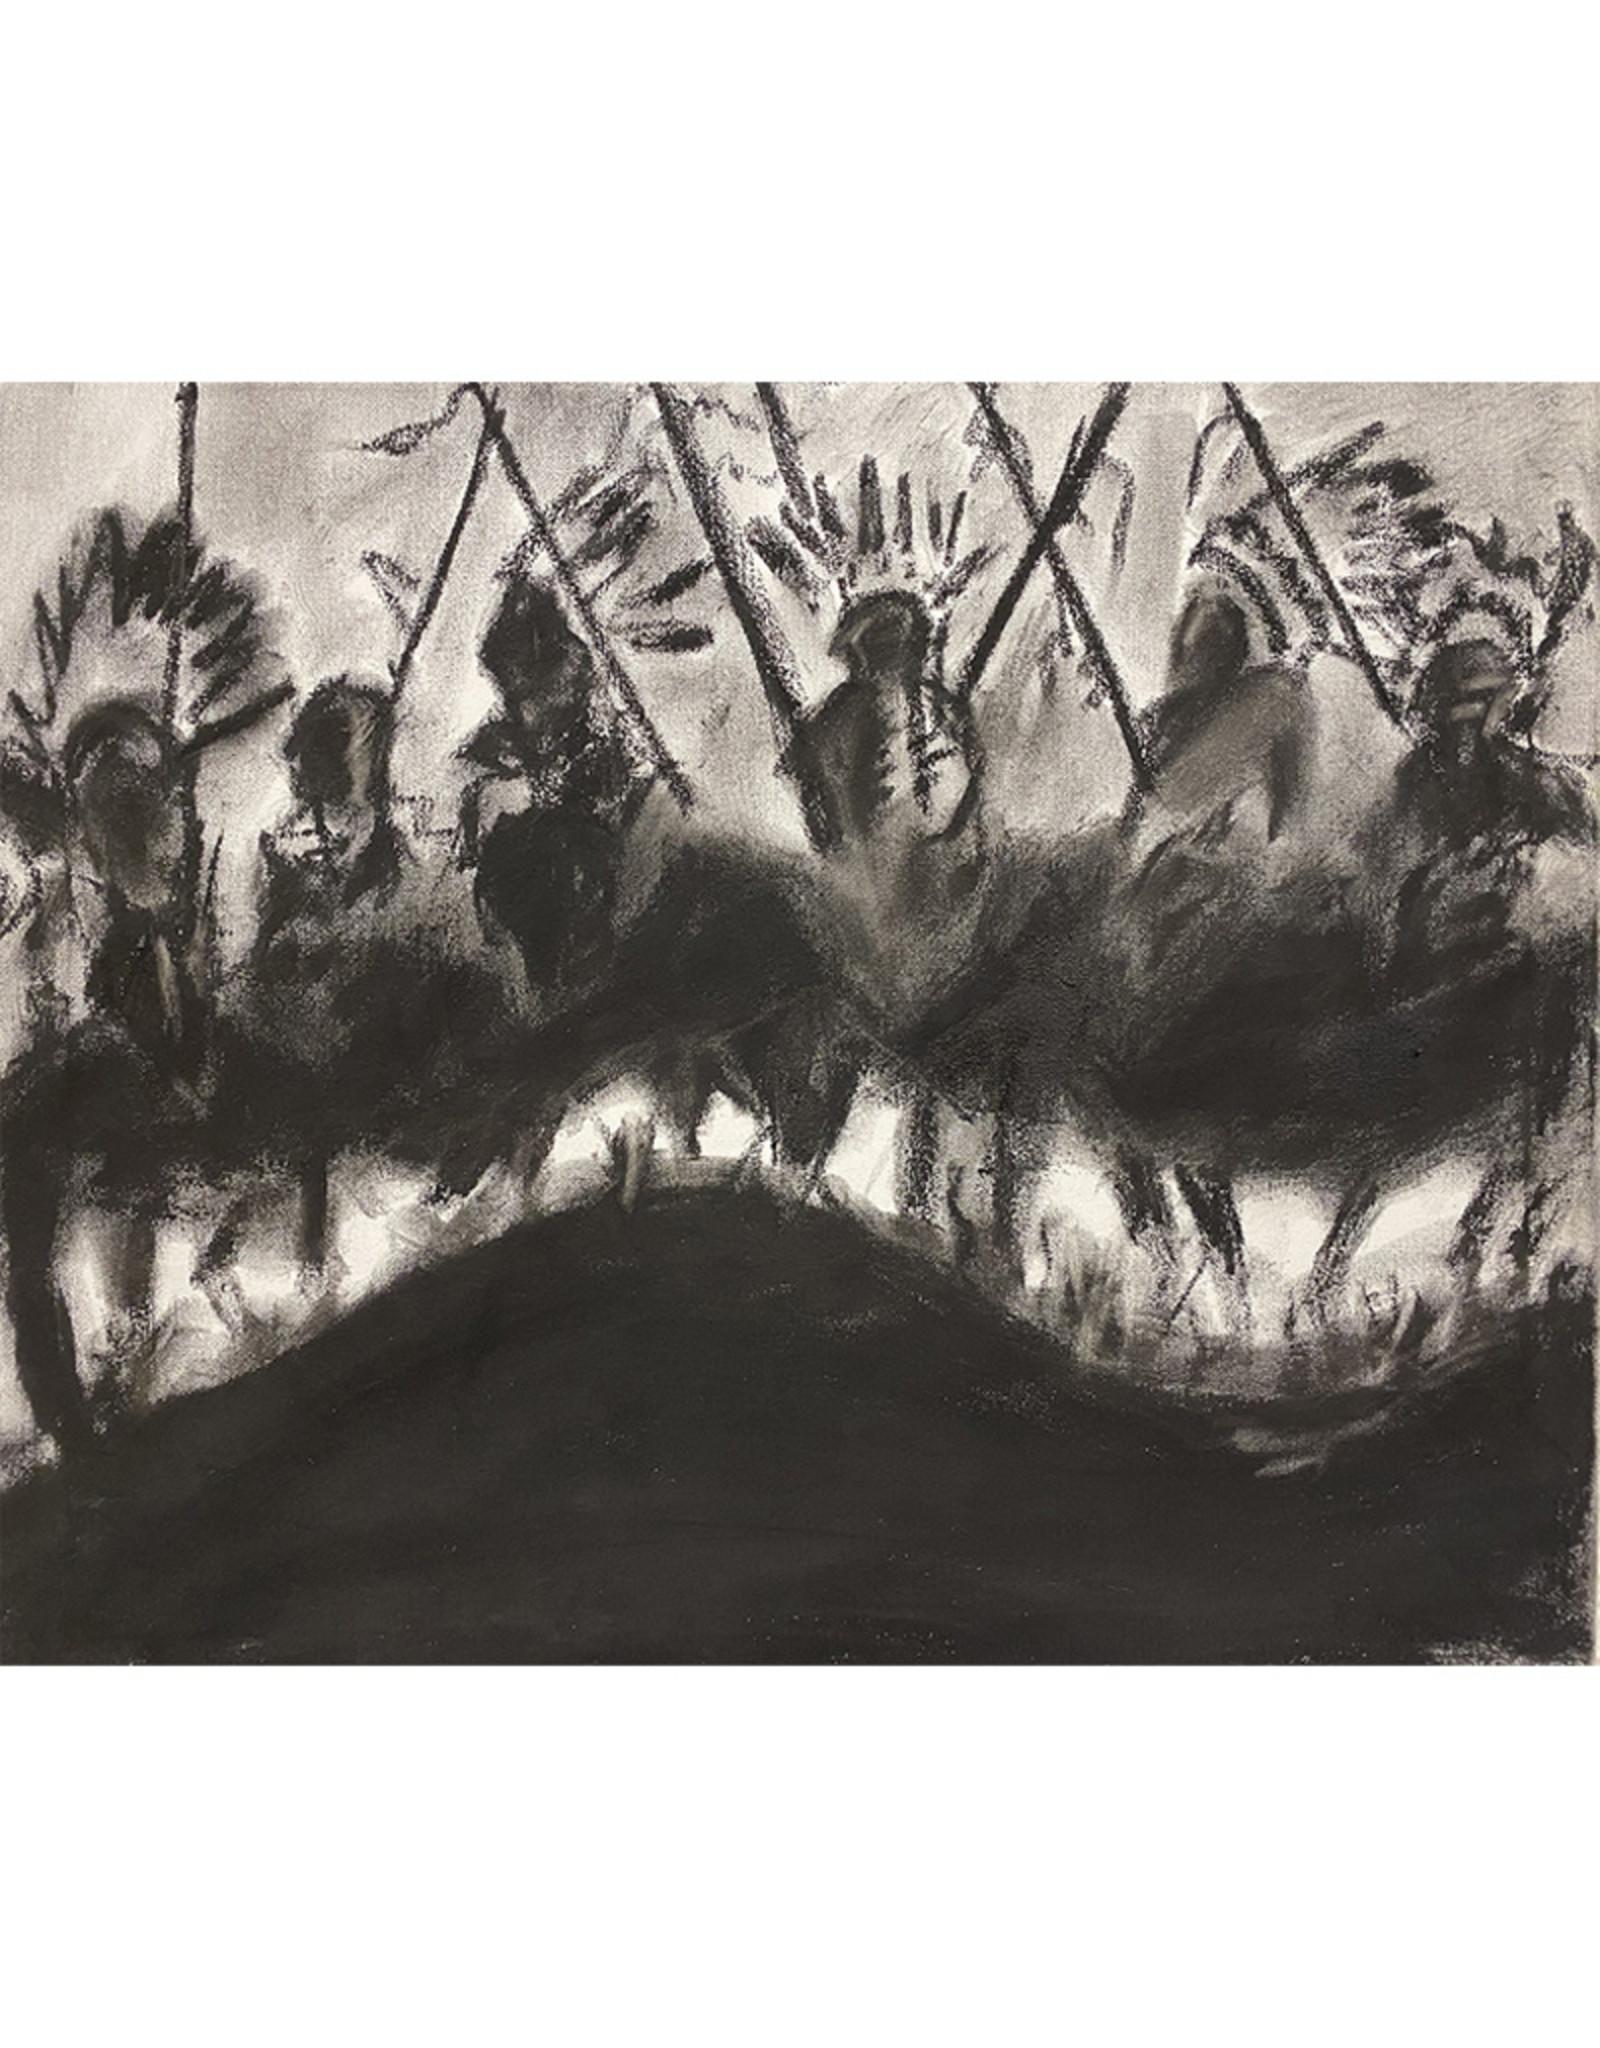 Travis Mammedaty Midnight Raid // Original Painting by Travis Mammedaty